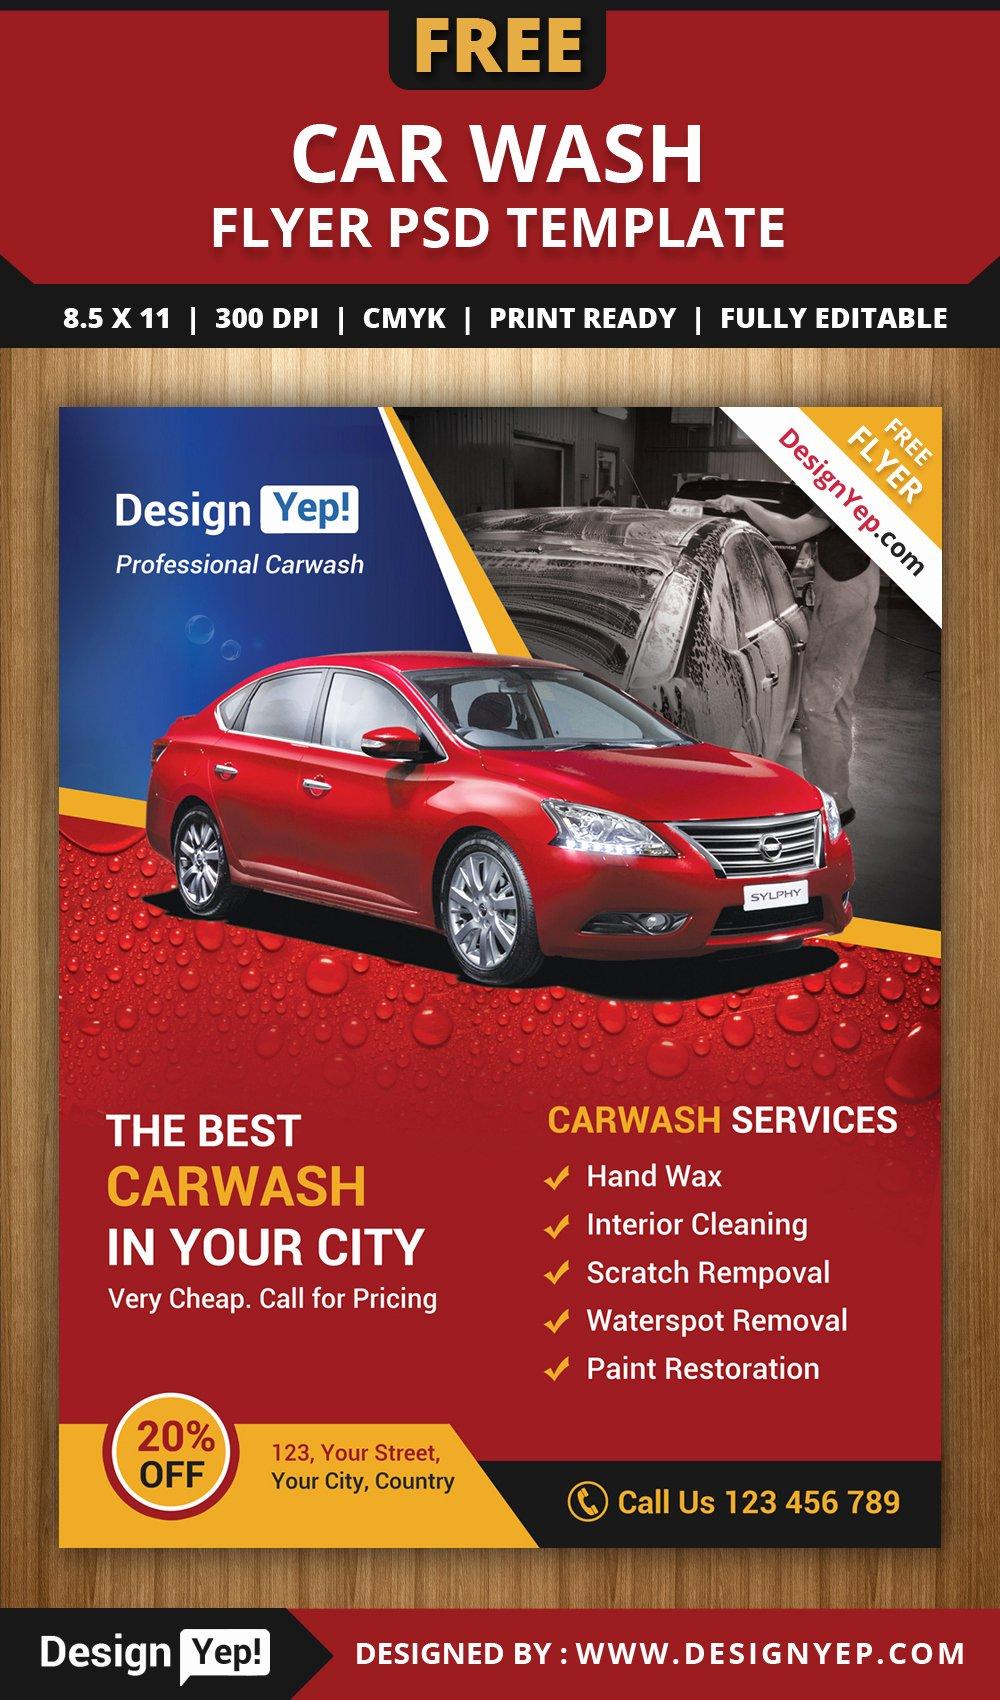 Car Wash Flyer Template Free Beautiful Free Car Wash Flyer Psd Template On Behance